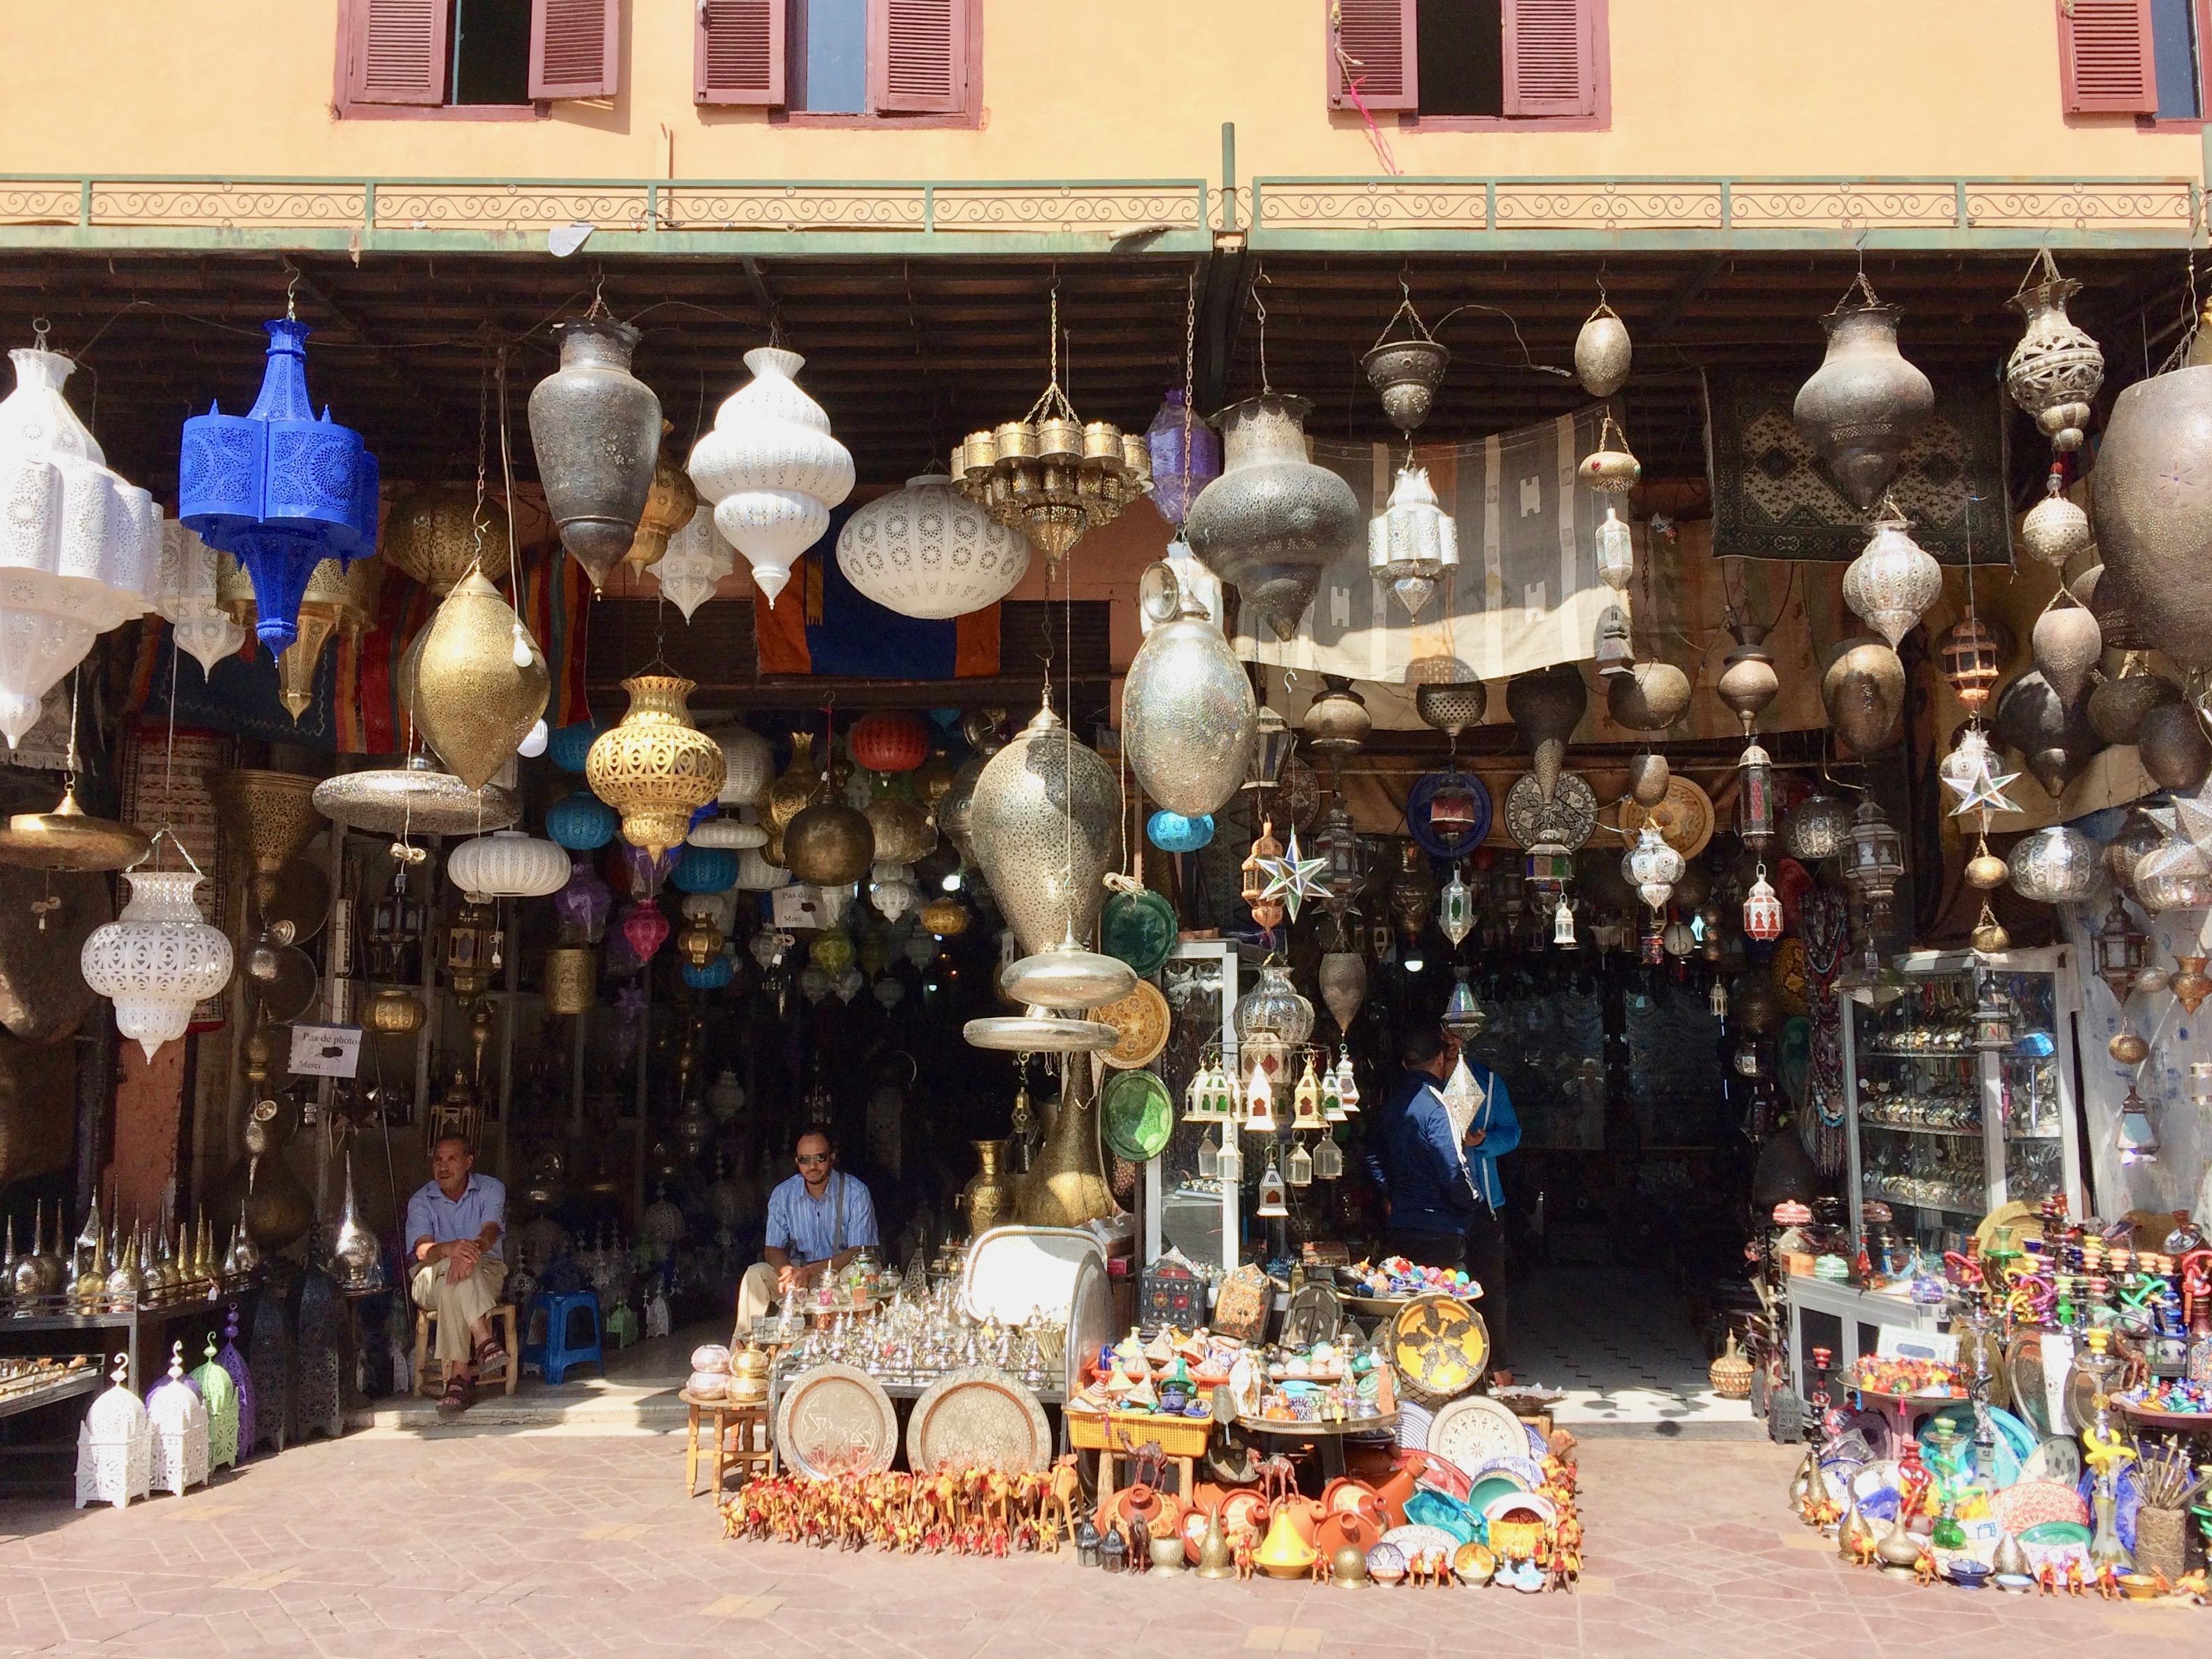 In Marrakesh Medina